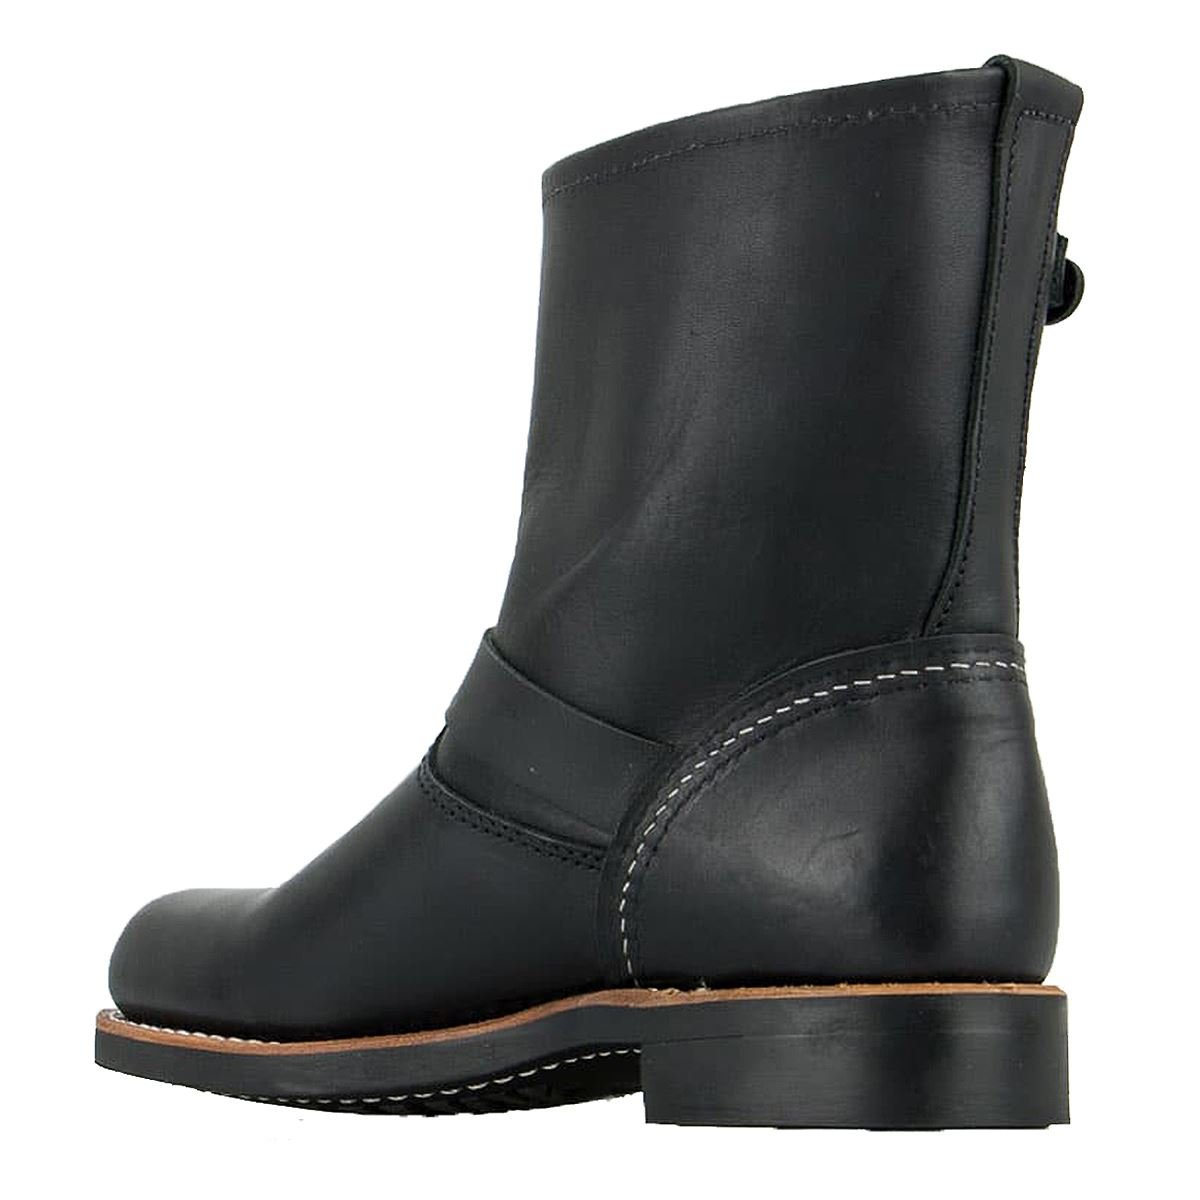 Rot Wing damen Engineer 3354 schwarz Leather Stiefel Stiefel Stiefel 37 EU d01286